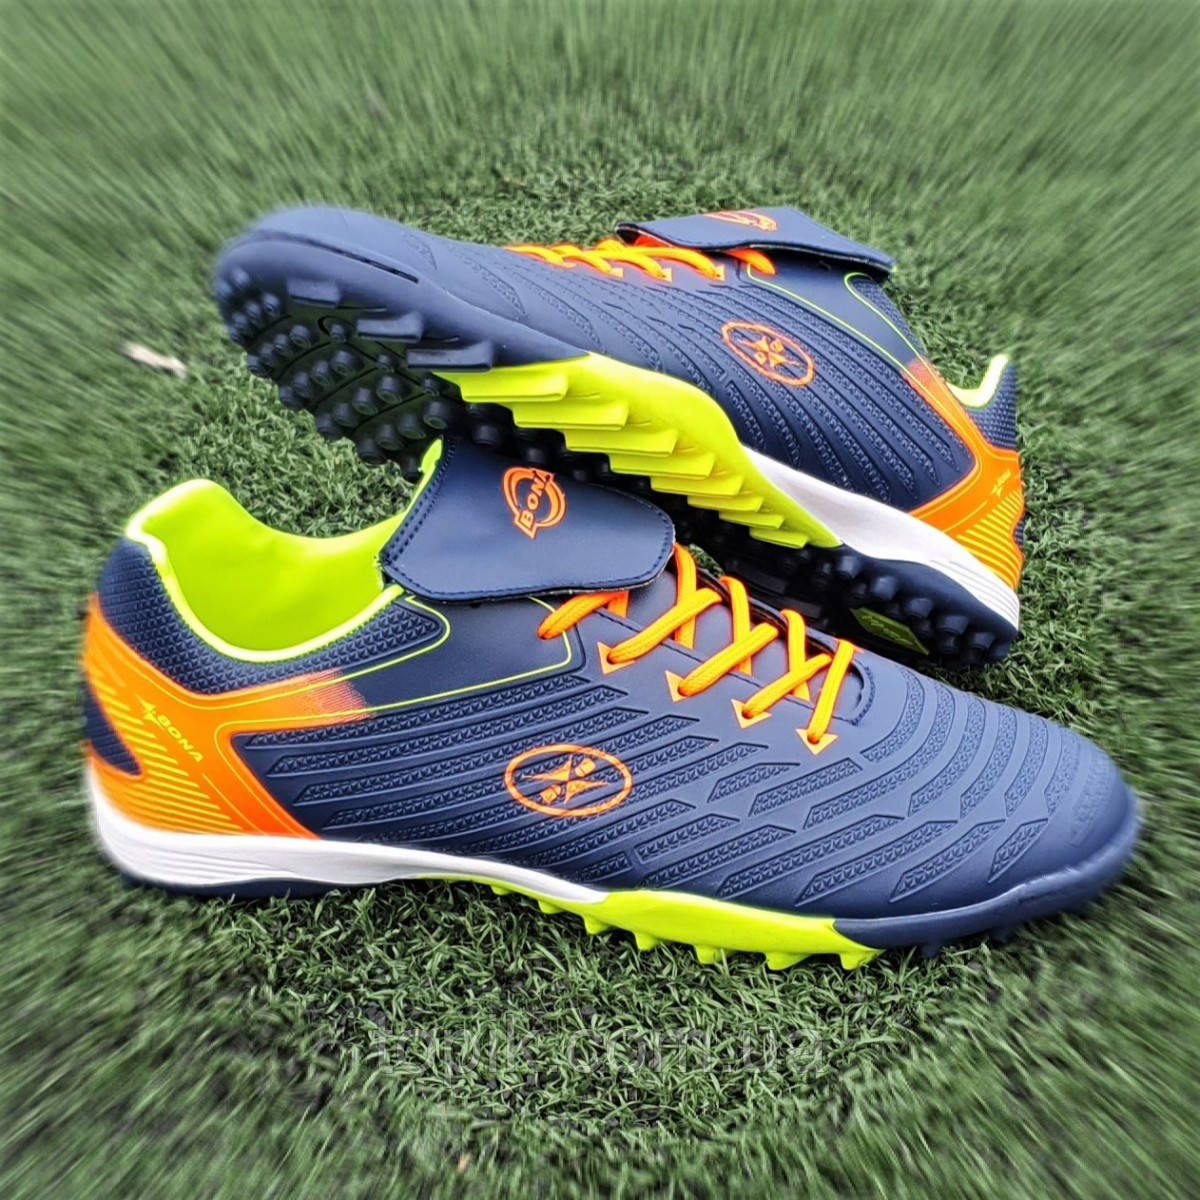 deae8cb1 Мужские сороконожки Tiempo, бампы, кроссовки для футбола темно синие  легкие, прошитый носок (